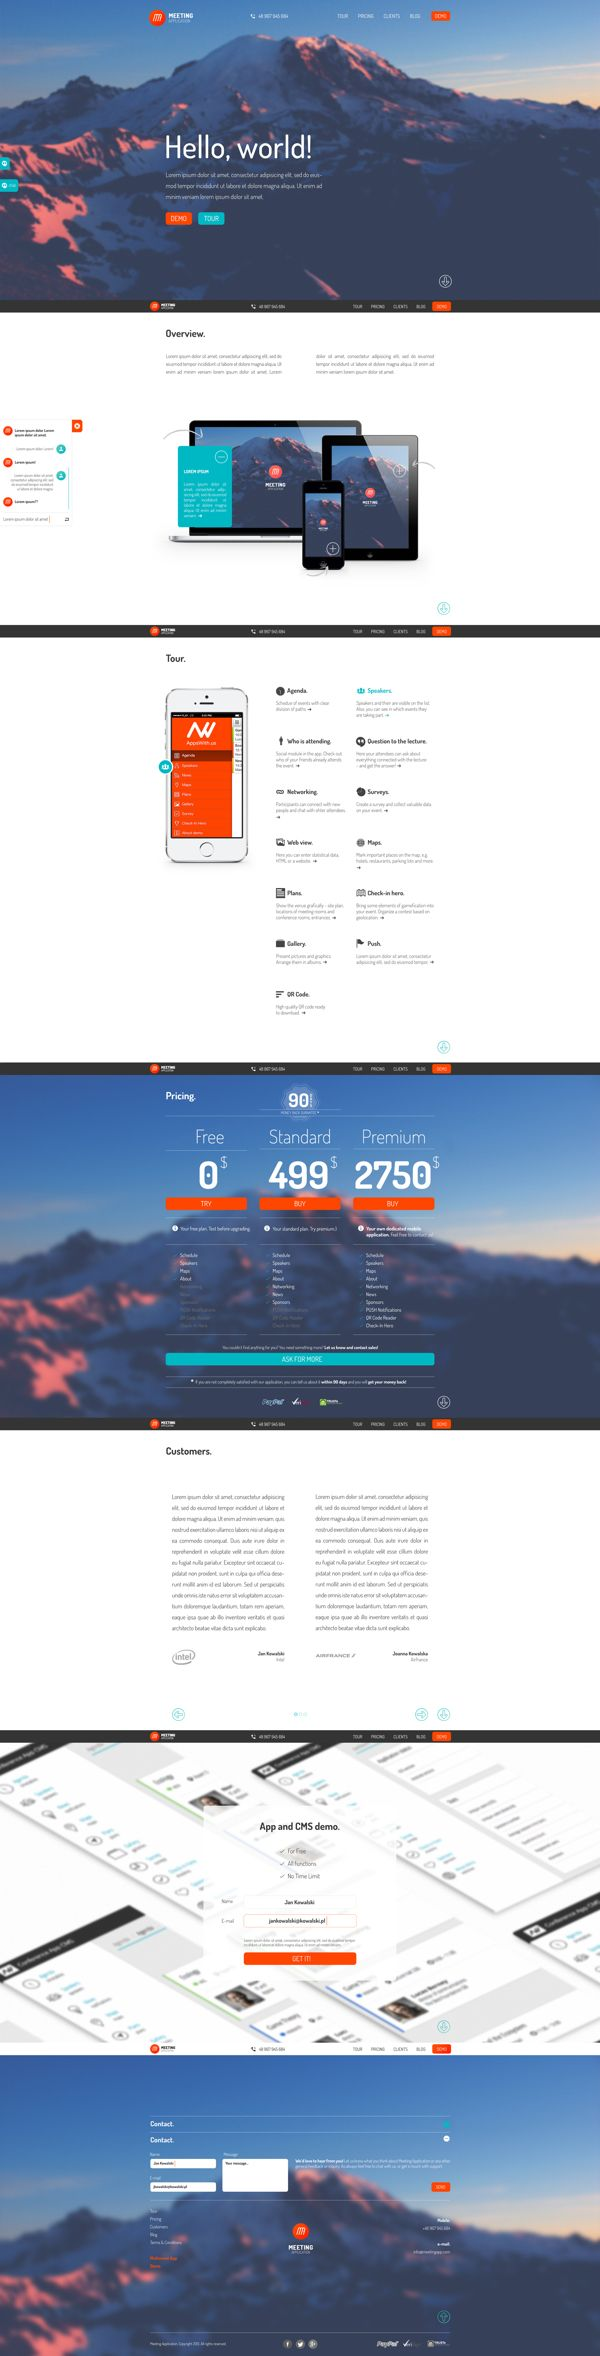 Meeting Application by Piotr Kozak, via Behance #ProntoDigital #WebDesign